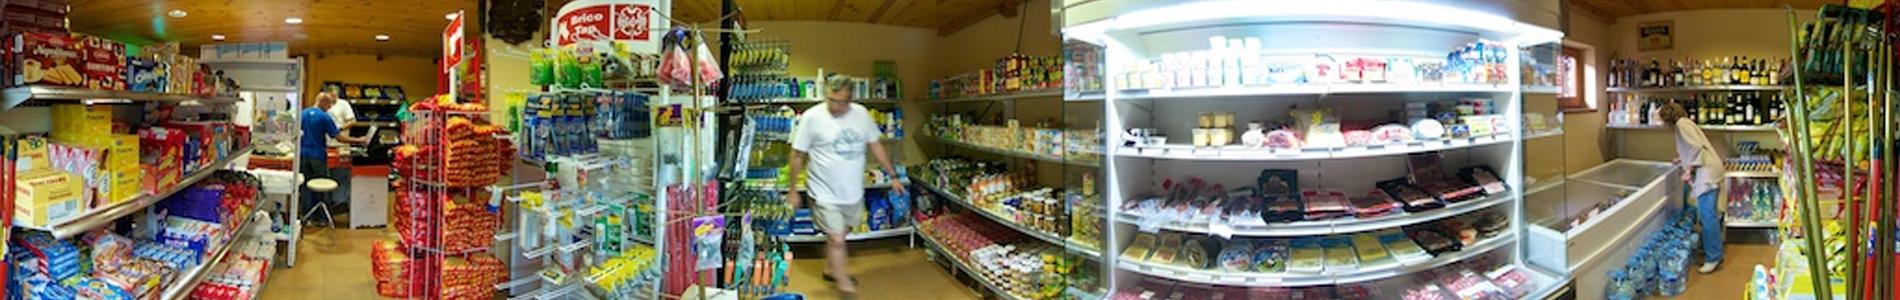 featured-supermercado